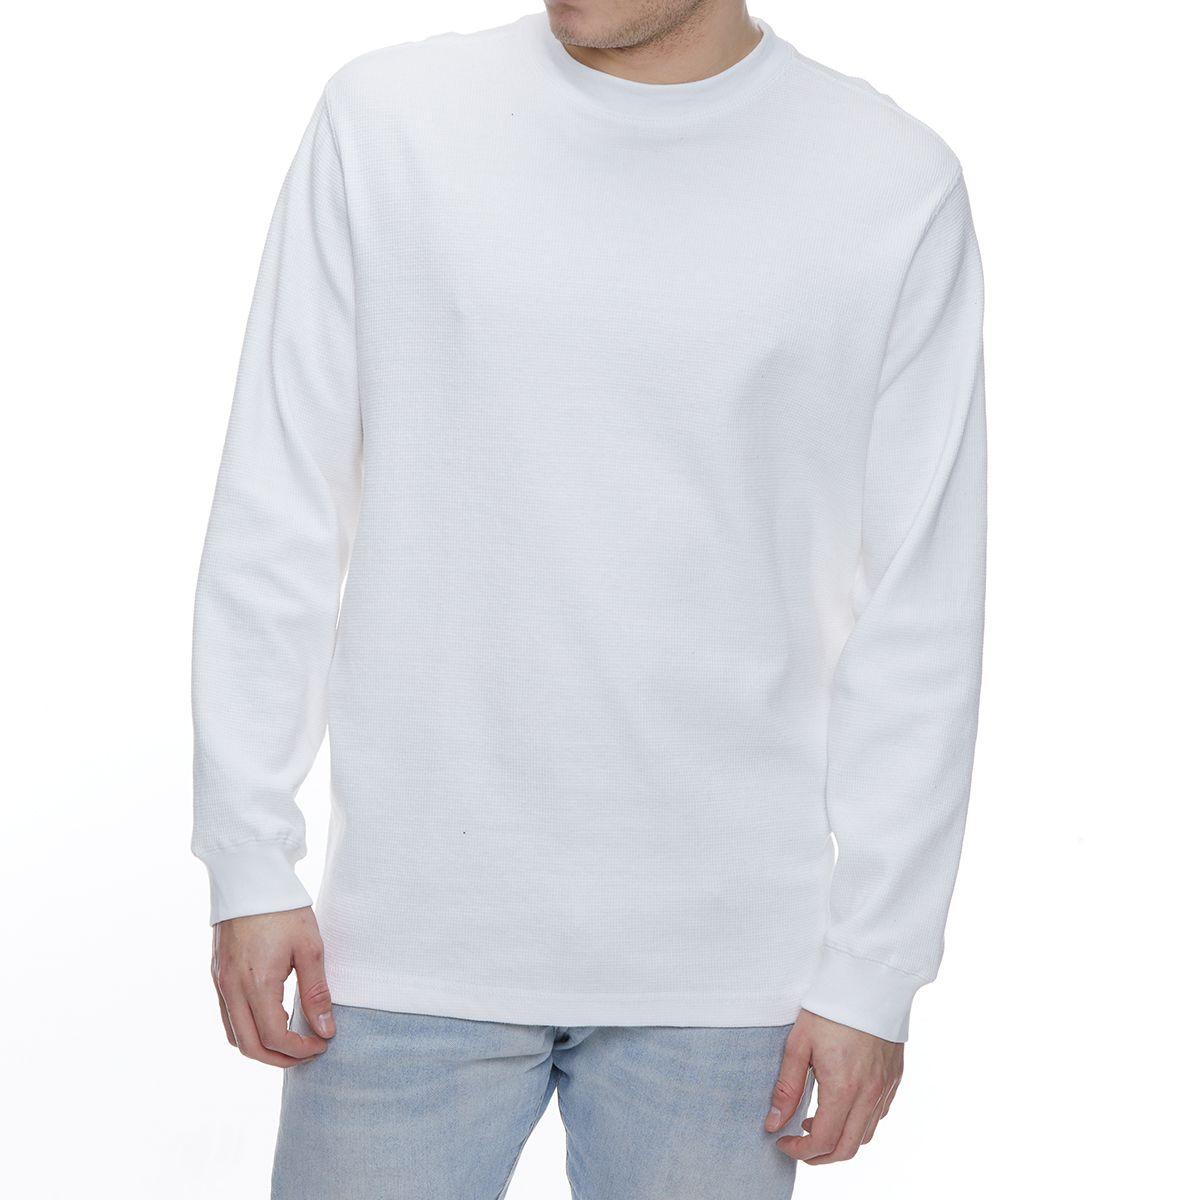 Gelert Men S Thermal Crew Long Sleeve Shirt In 2021 Long Sleeve Shirts Mens Thermals Shirts [ 1200 x 1200 Pixel ]